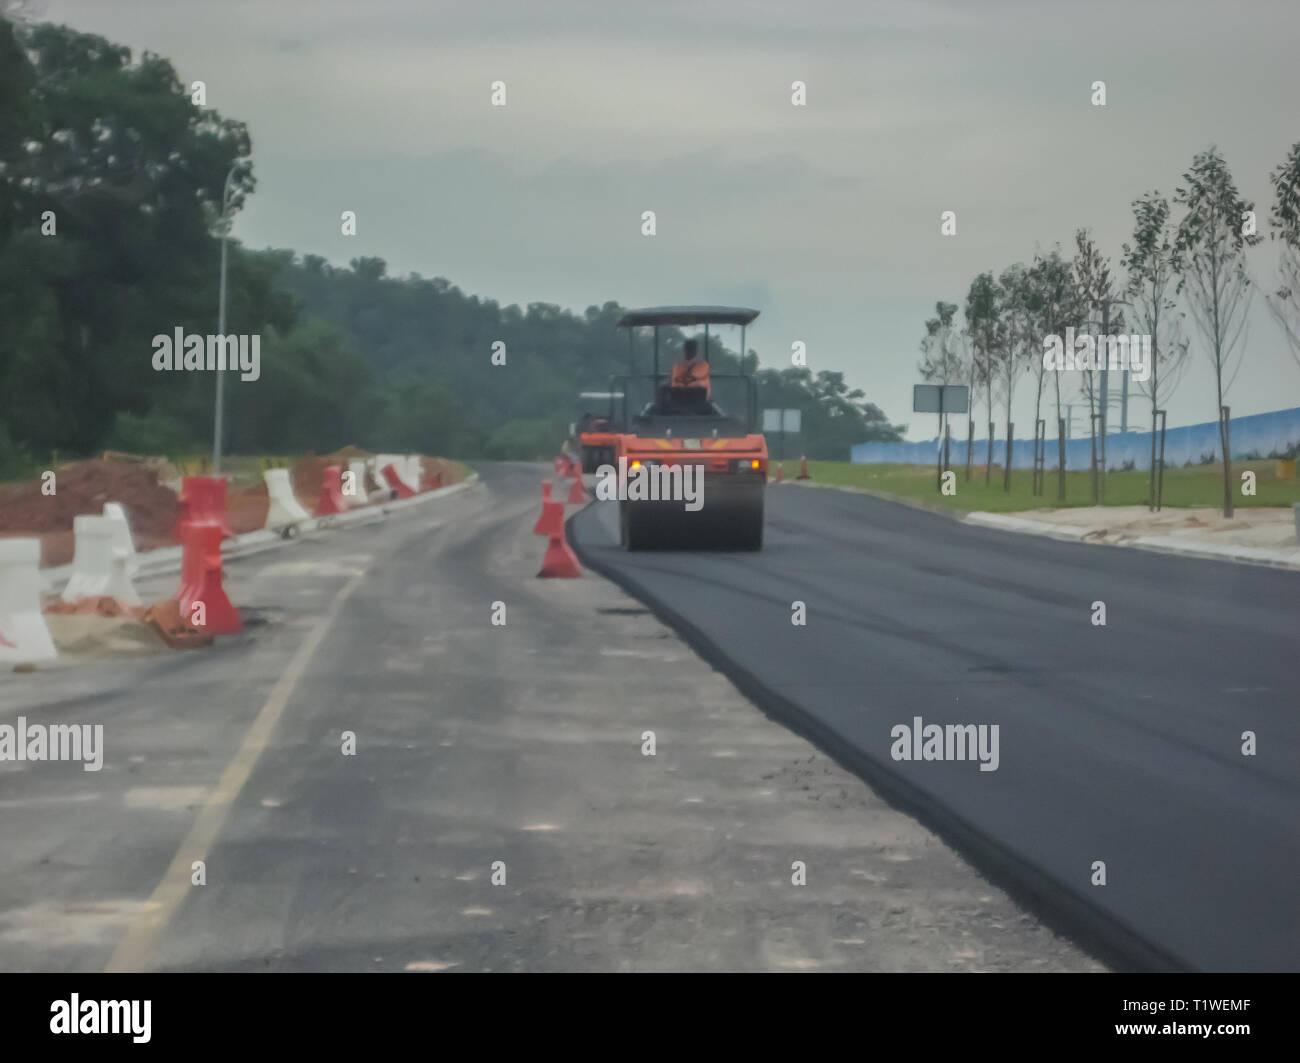 Road development in Iskandar Puteri, Johor, Malaysia - Stock Image